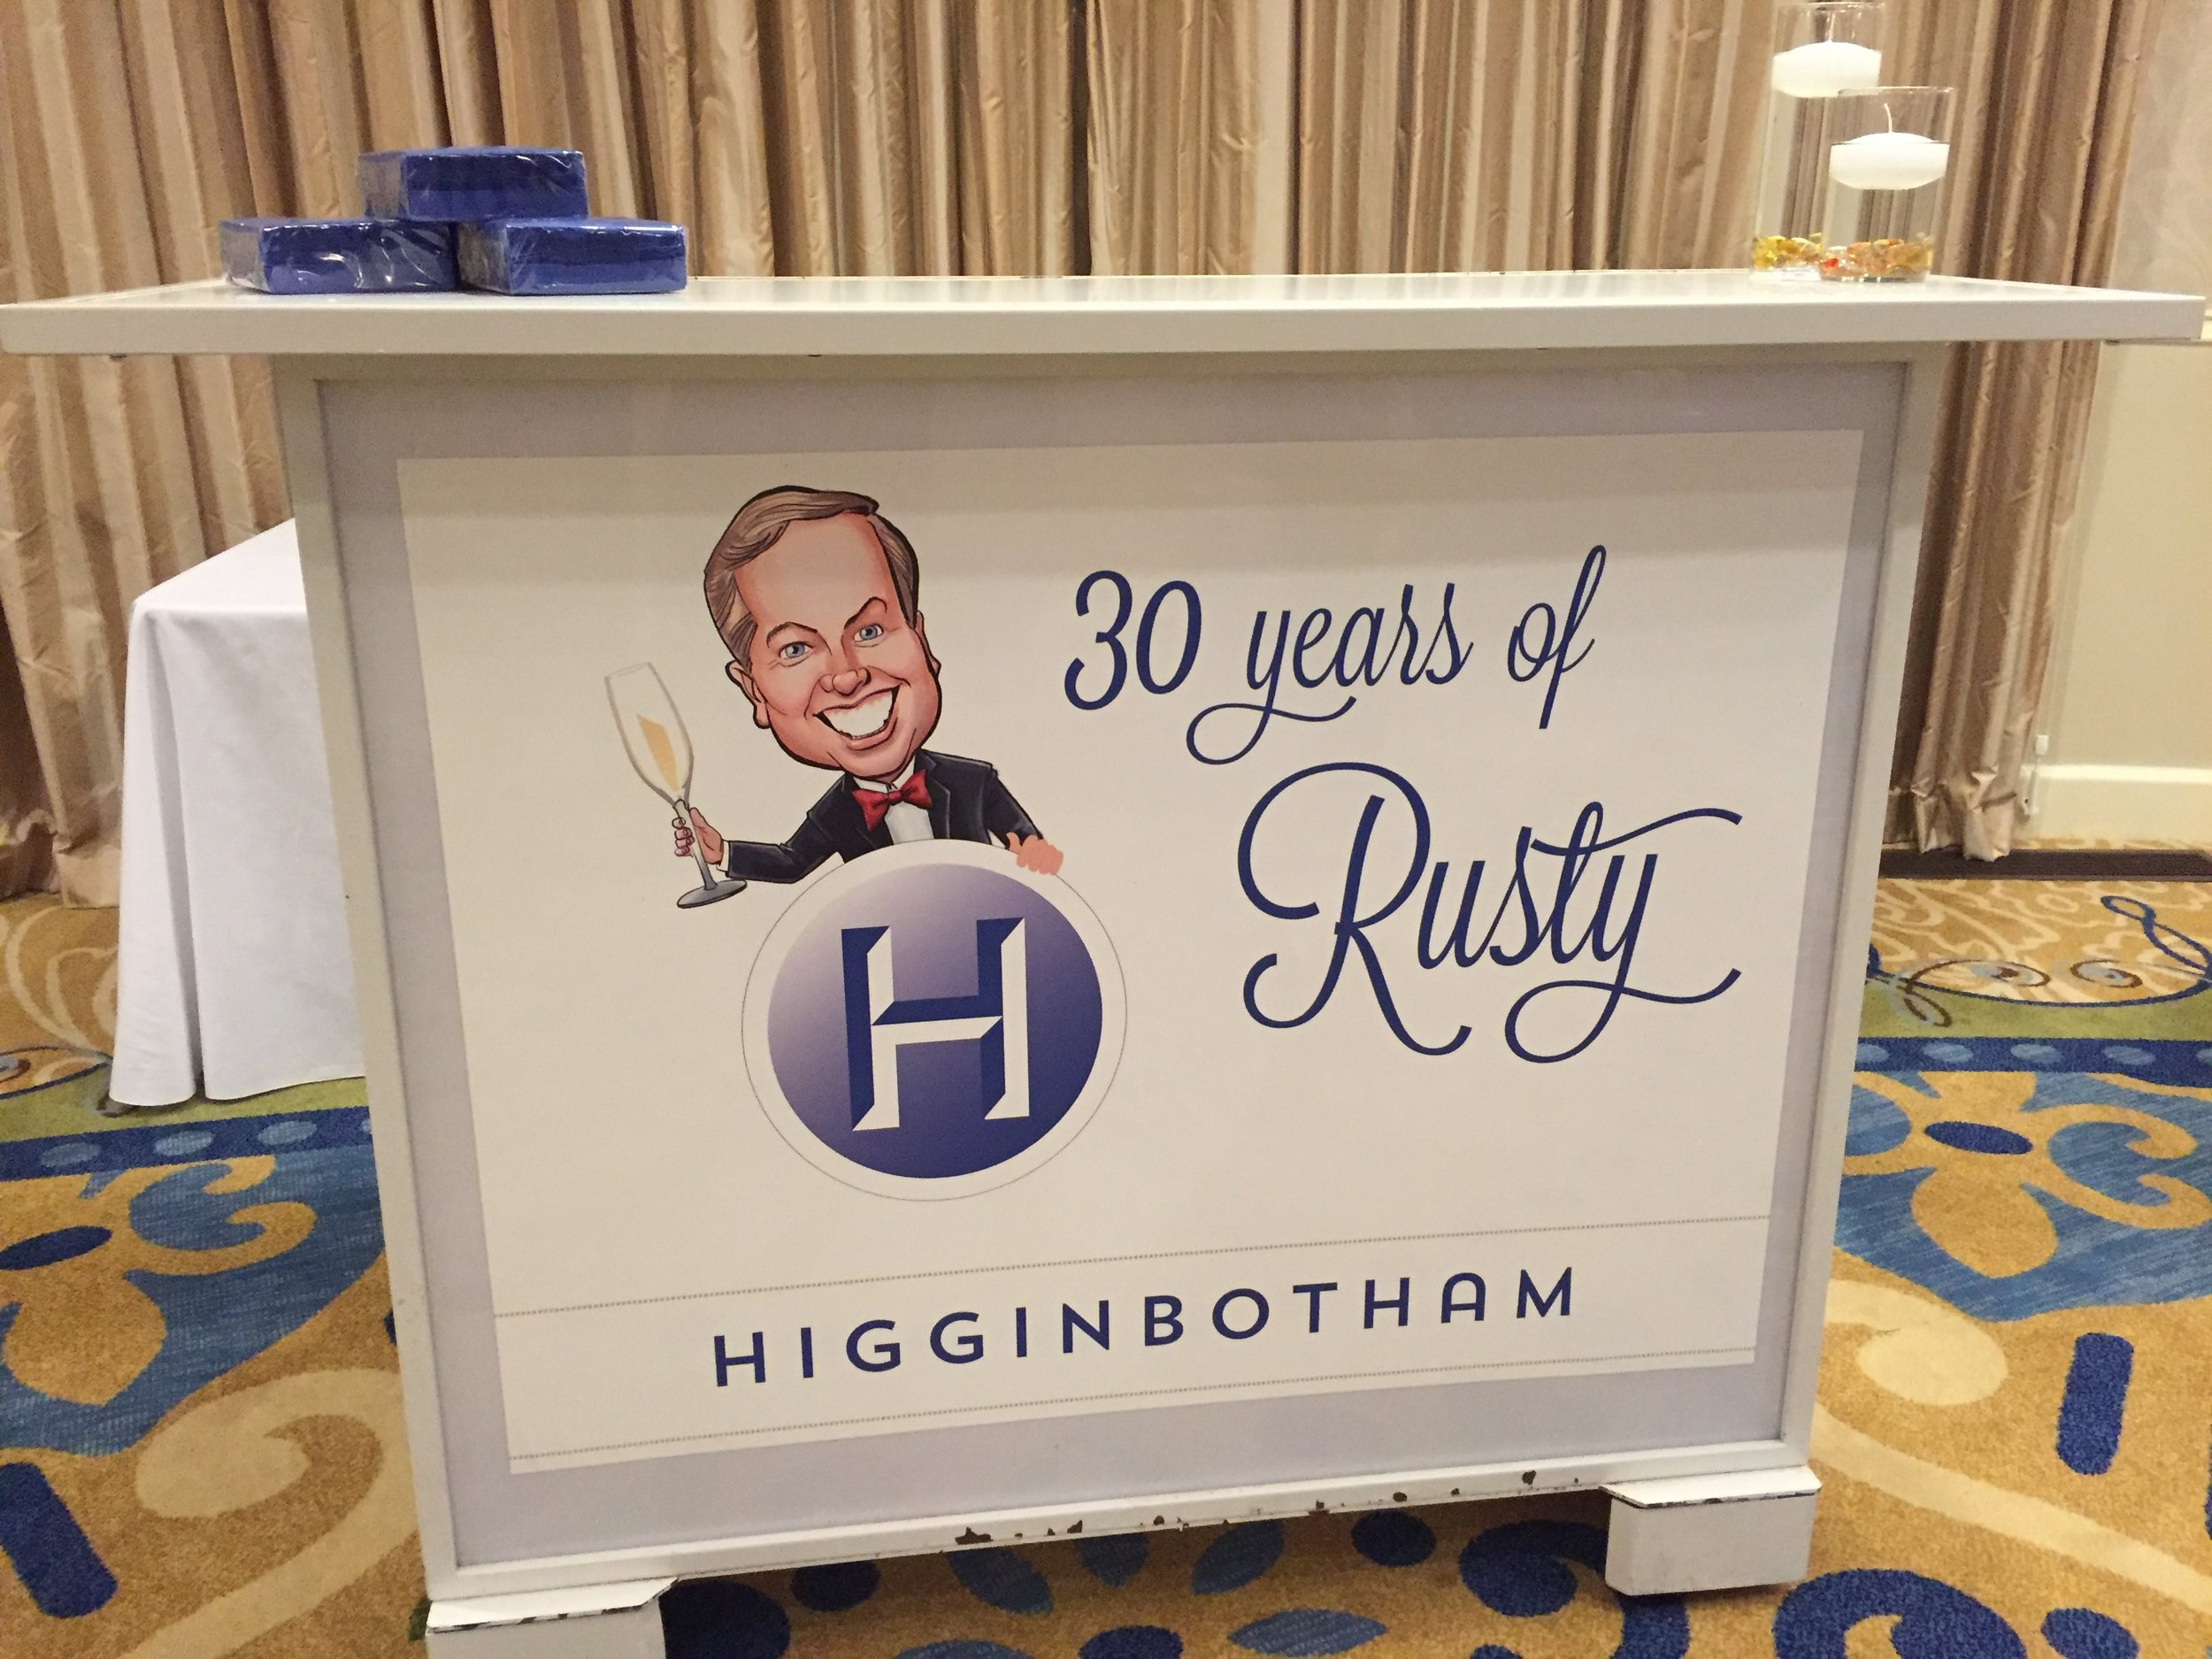 Rusty's 30th Anniversary